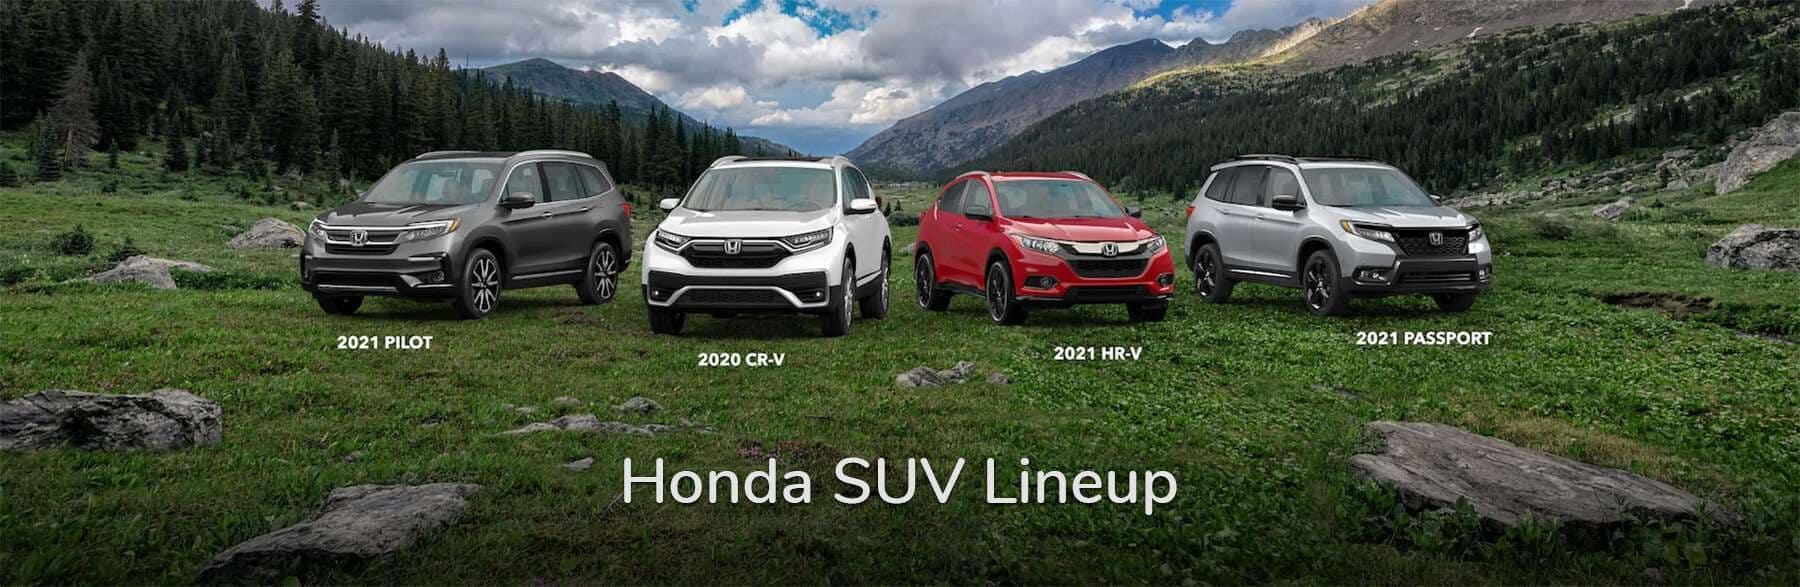 Honda SUV Lineup Vern Eide Honda Sioux City Slider